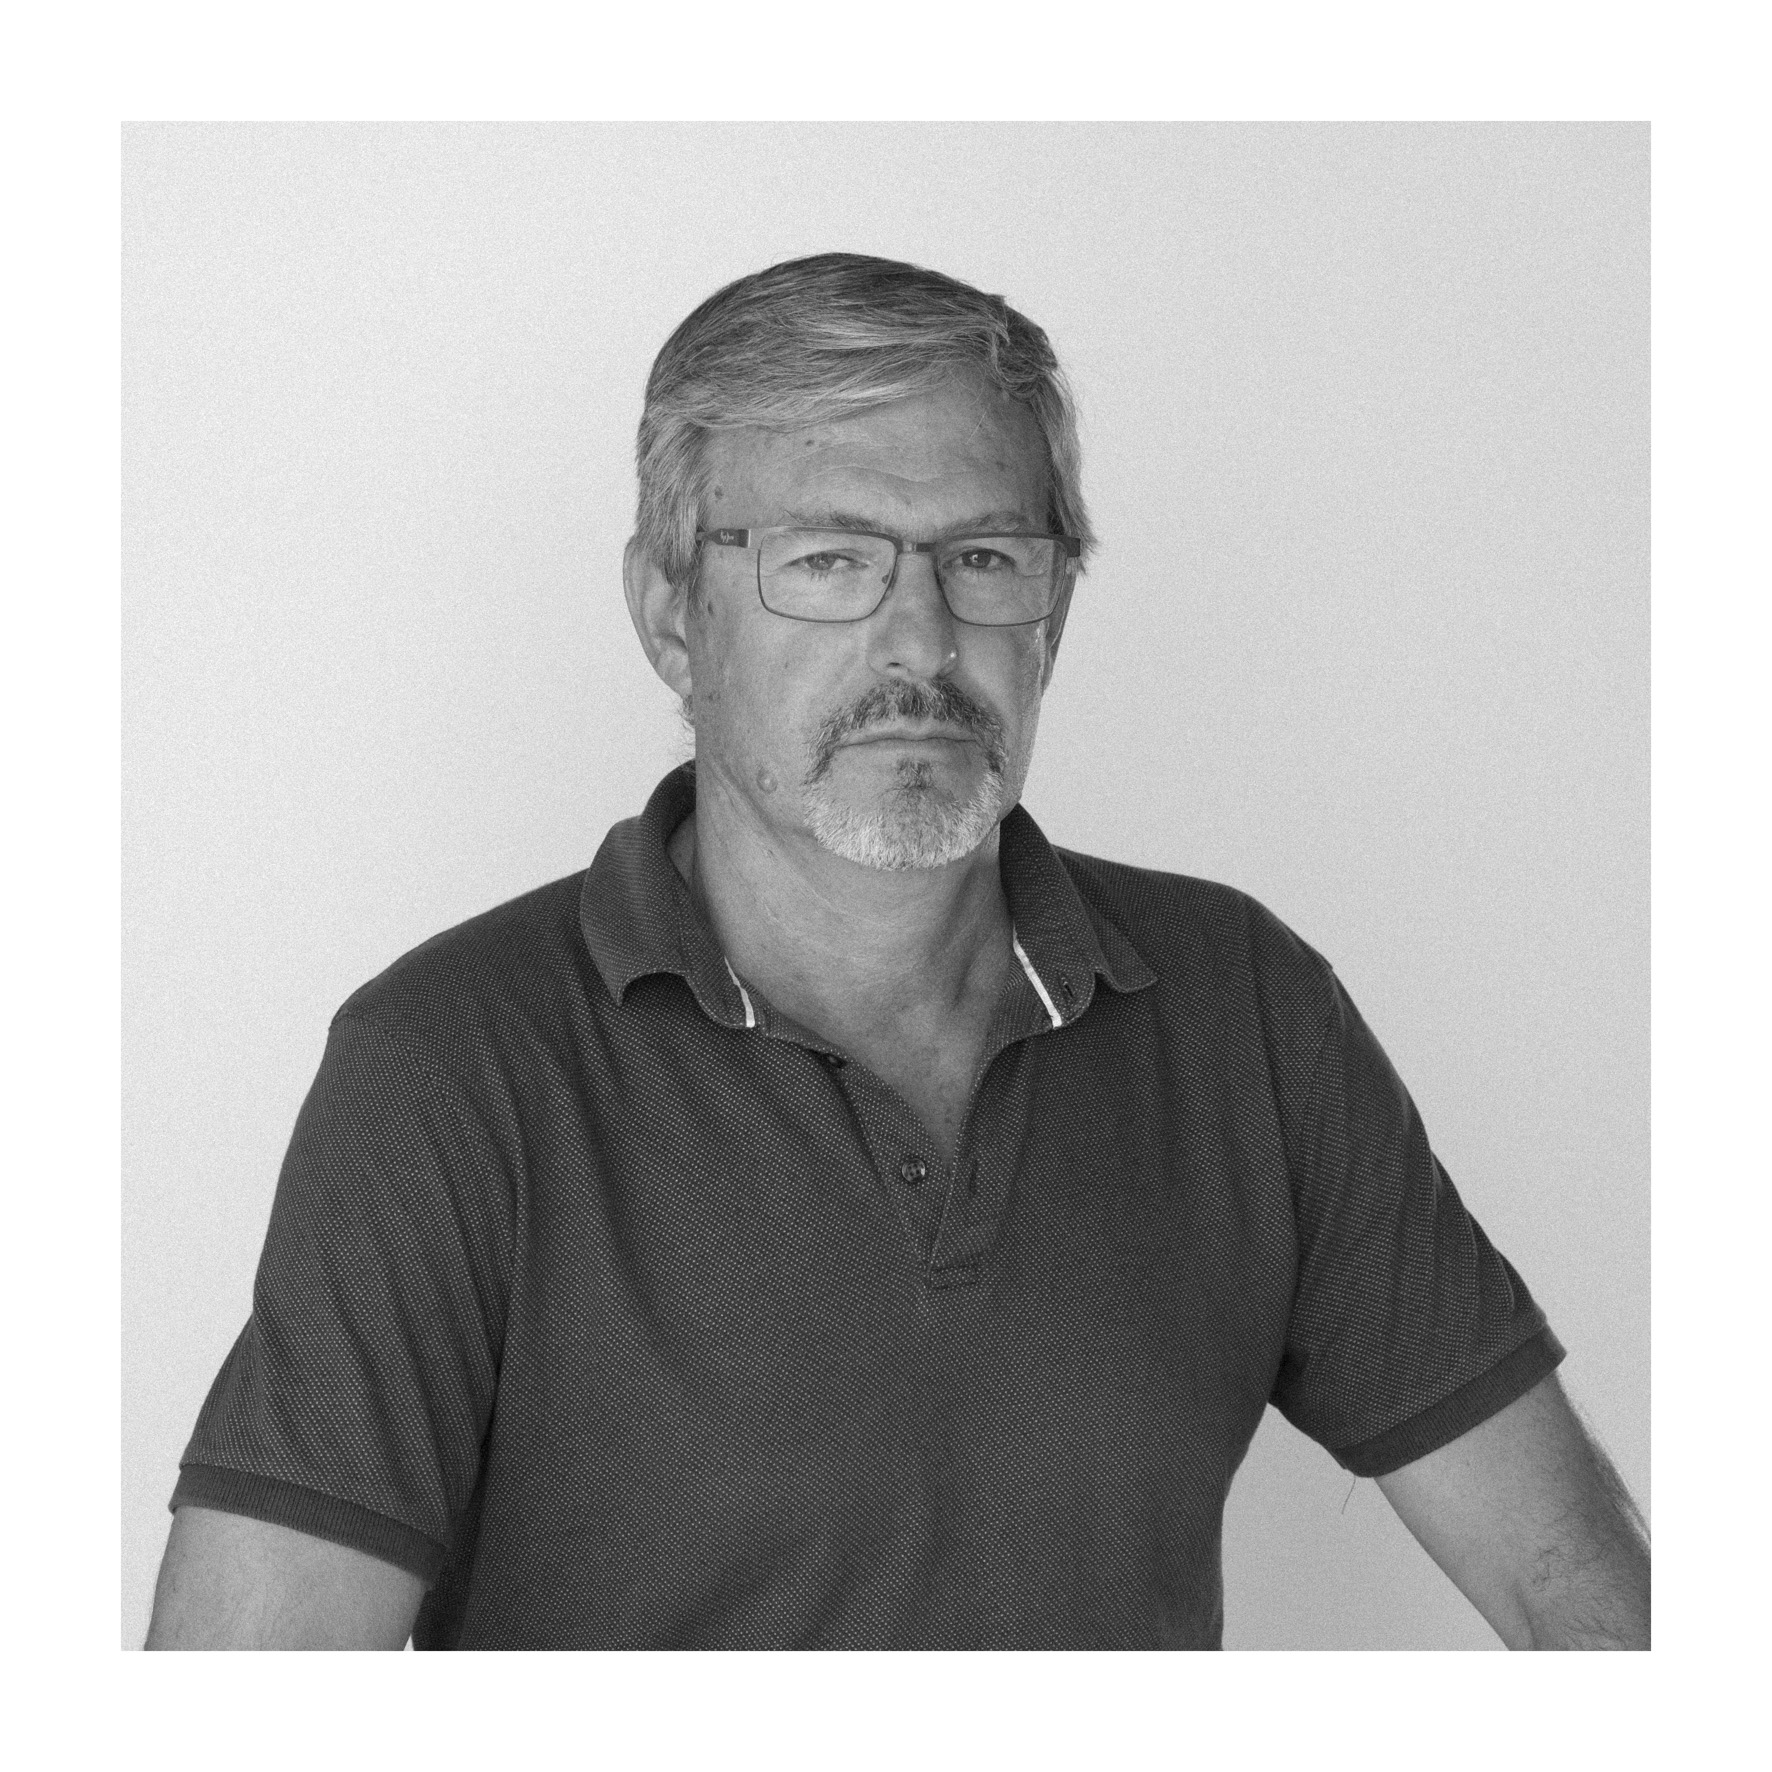 Manuel Jiménez (manuel_jimenez.jpg)